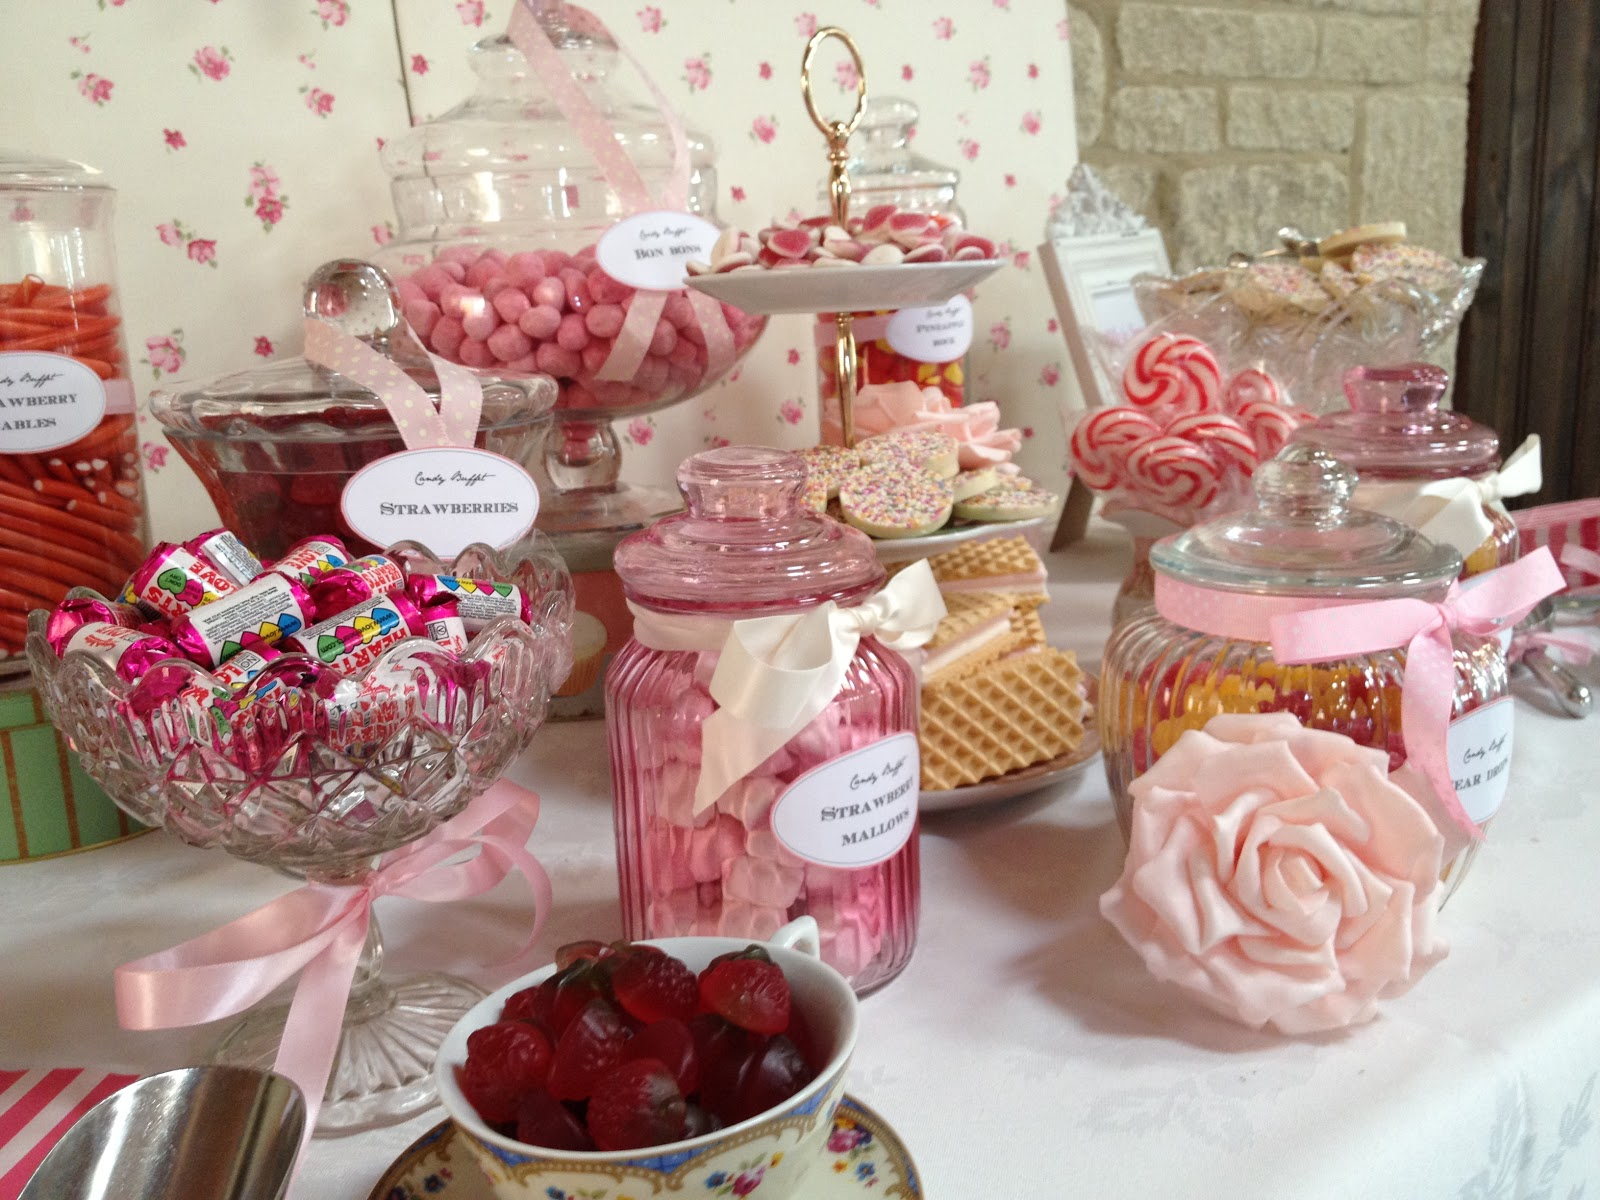 Wedding Sweet Table Ideas: Bristol Vintage Wedding Fair: Sweet & Pretty Weddings And